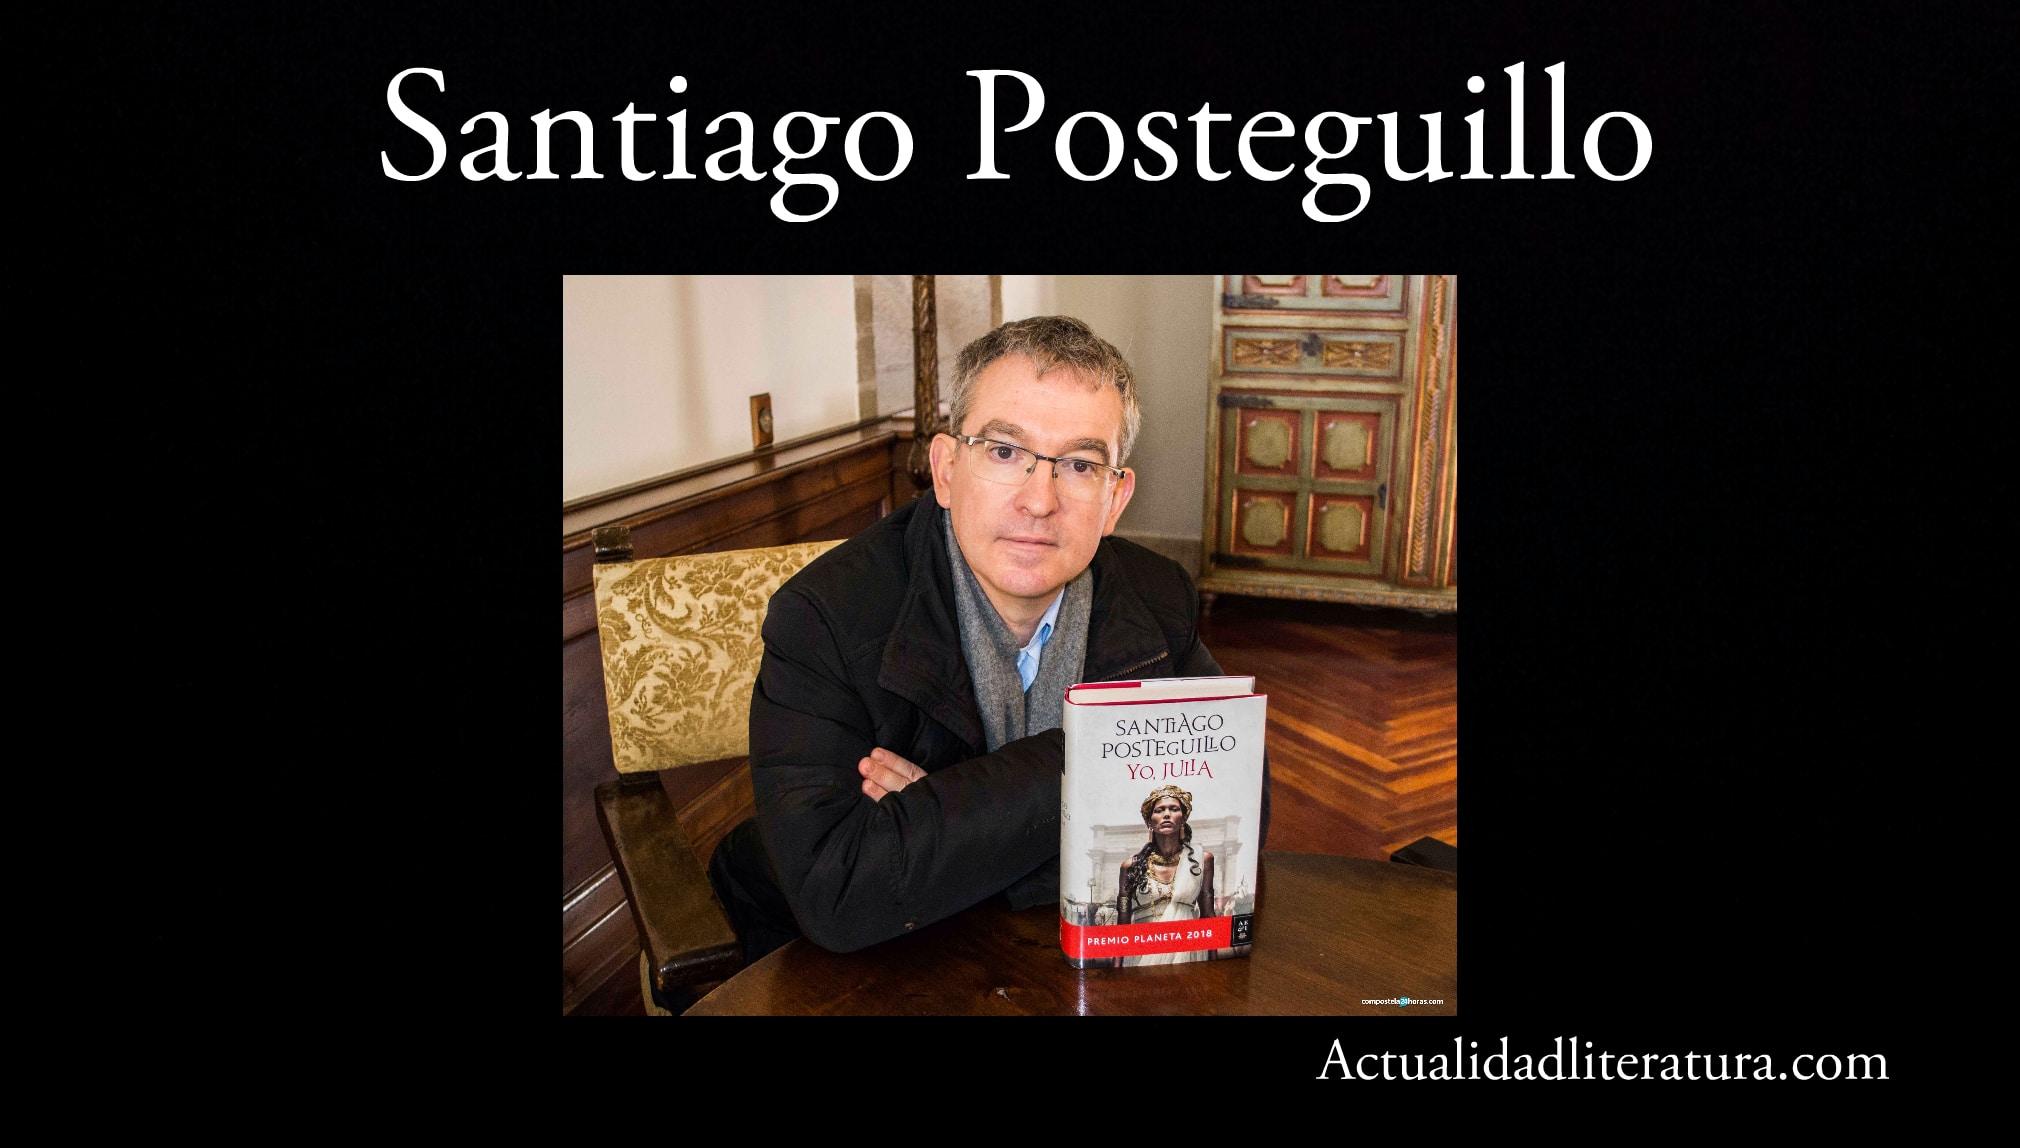 Santiago Posteguillo.